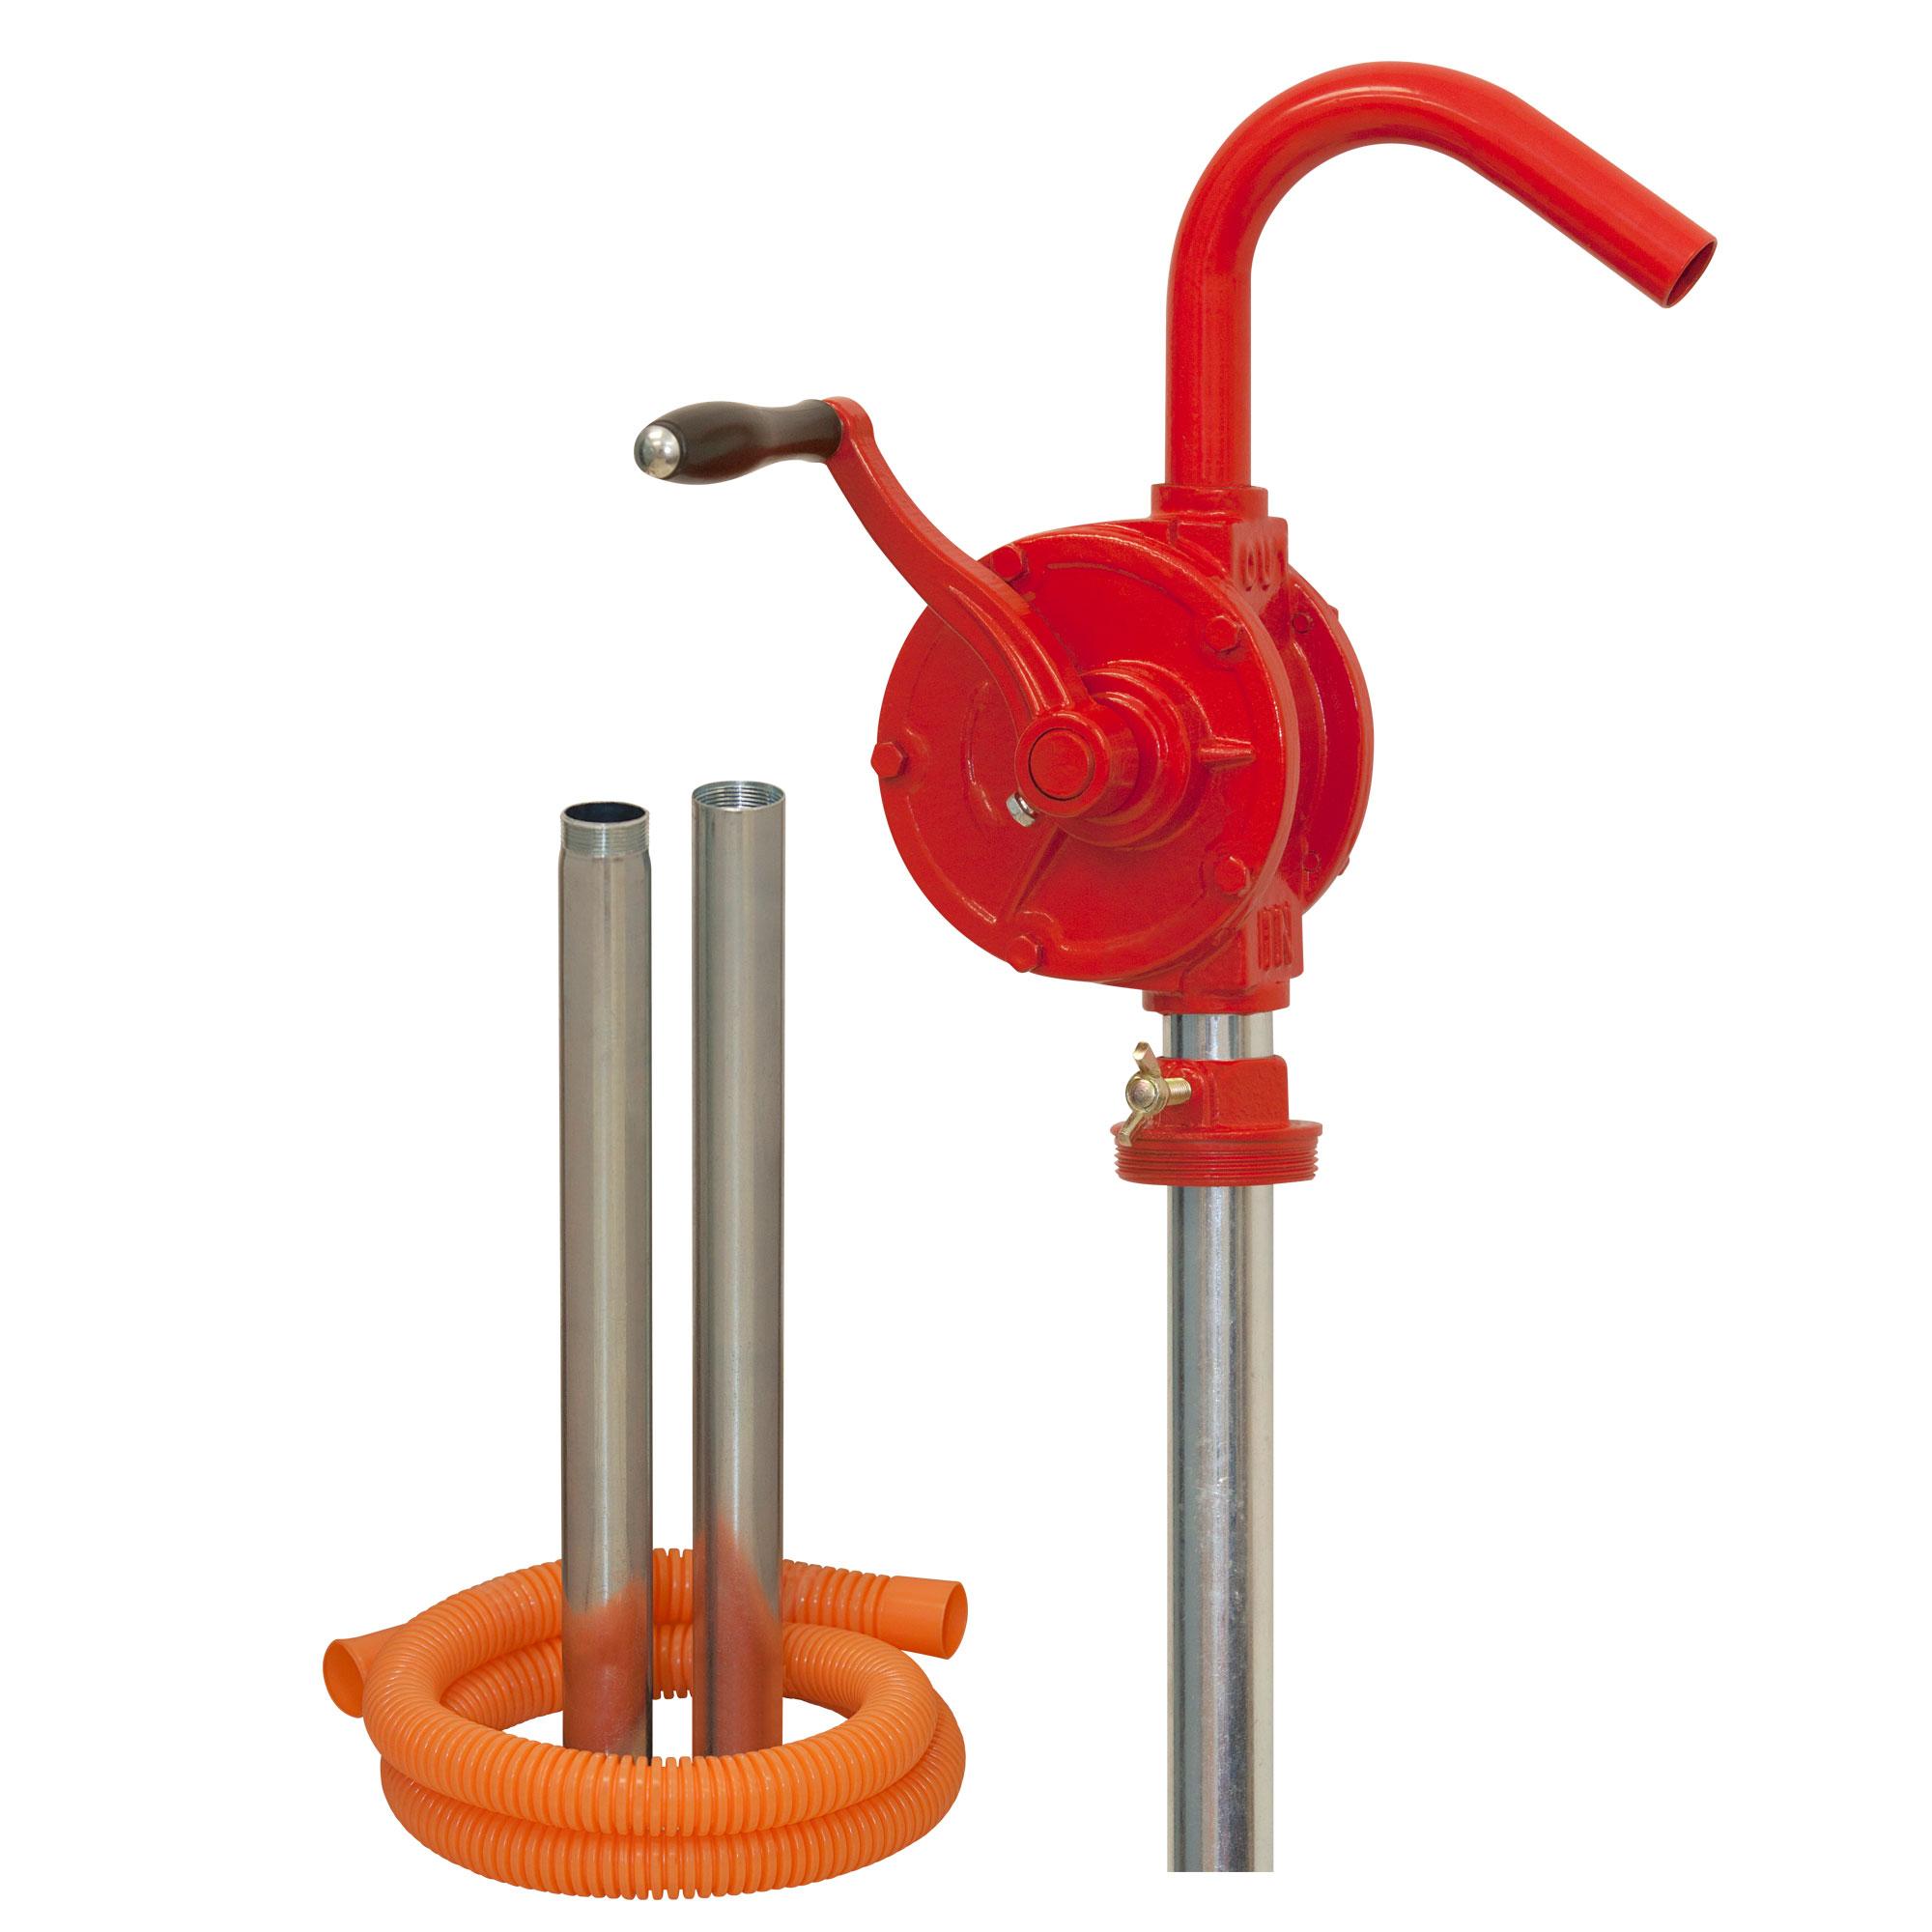 TEC60205P - Cast Iron Rotary Drum Pump